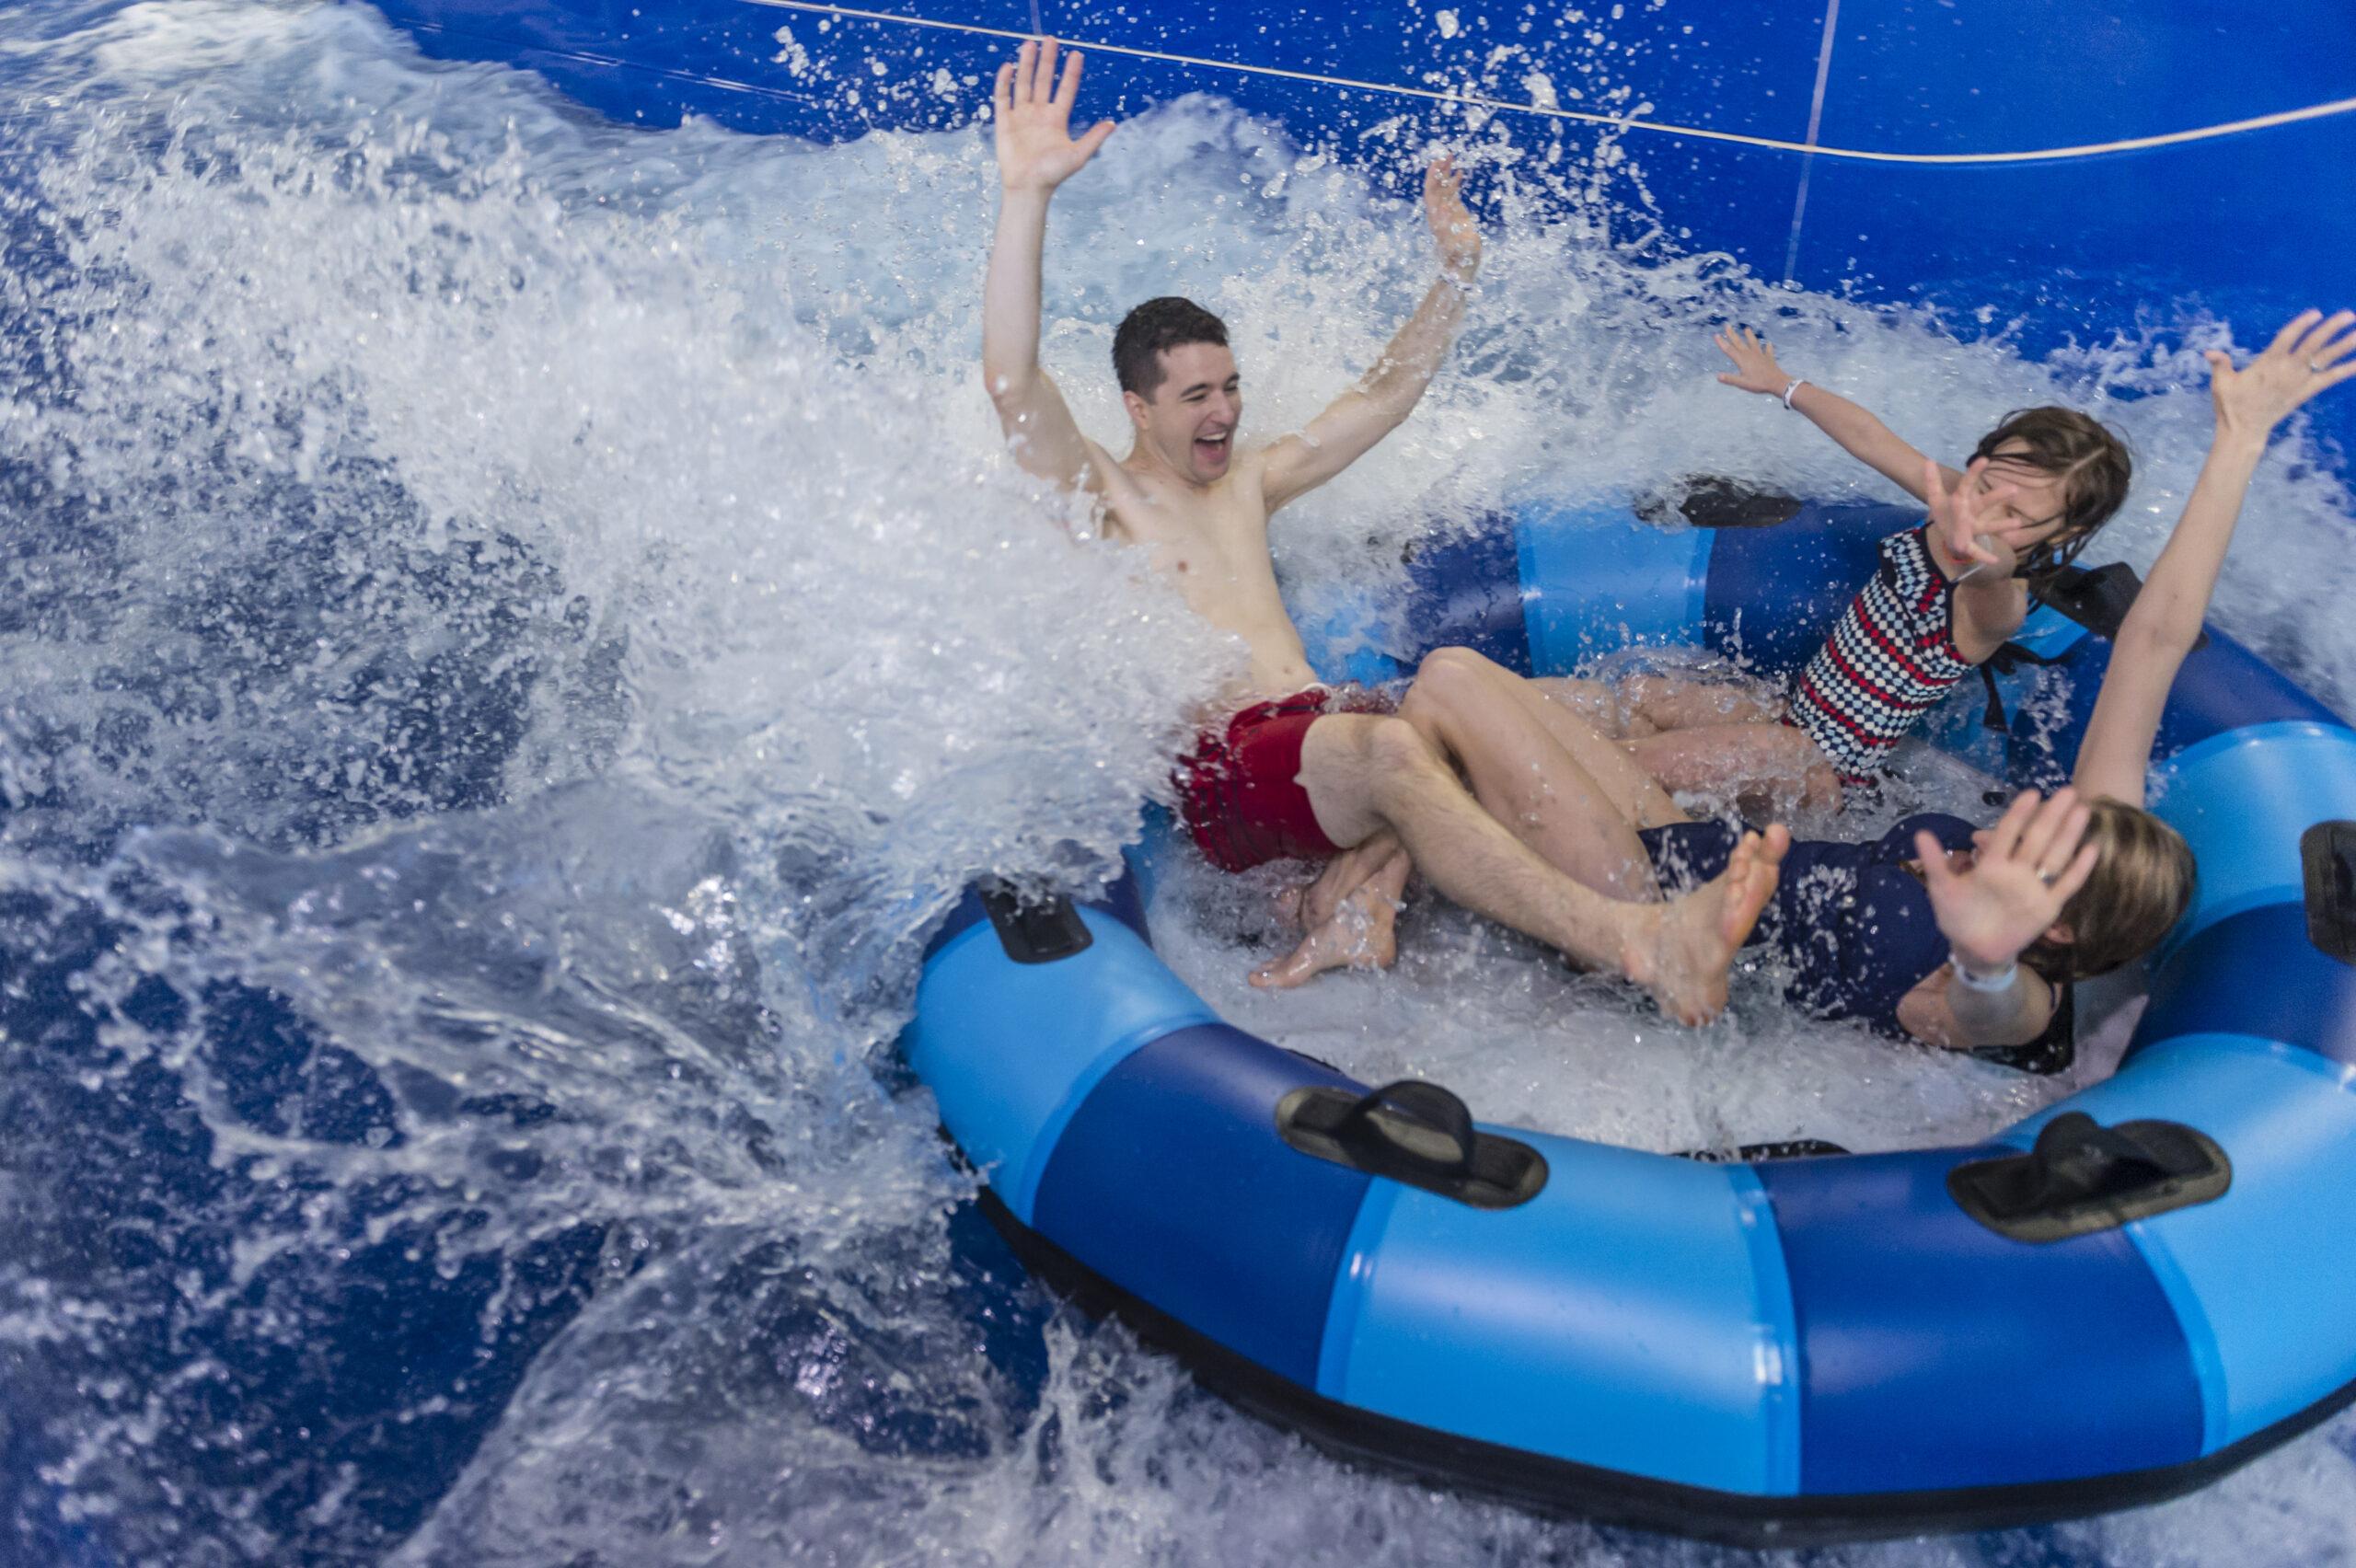 Kids enjoy an inner tube ride at Kalahari Resort, Pennsylvania